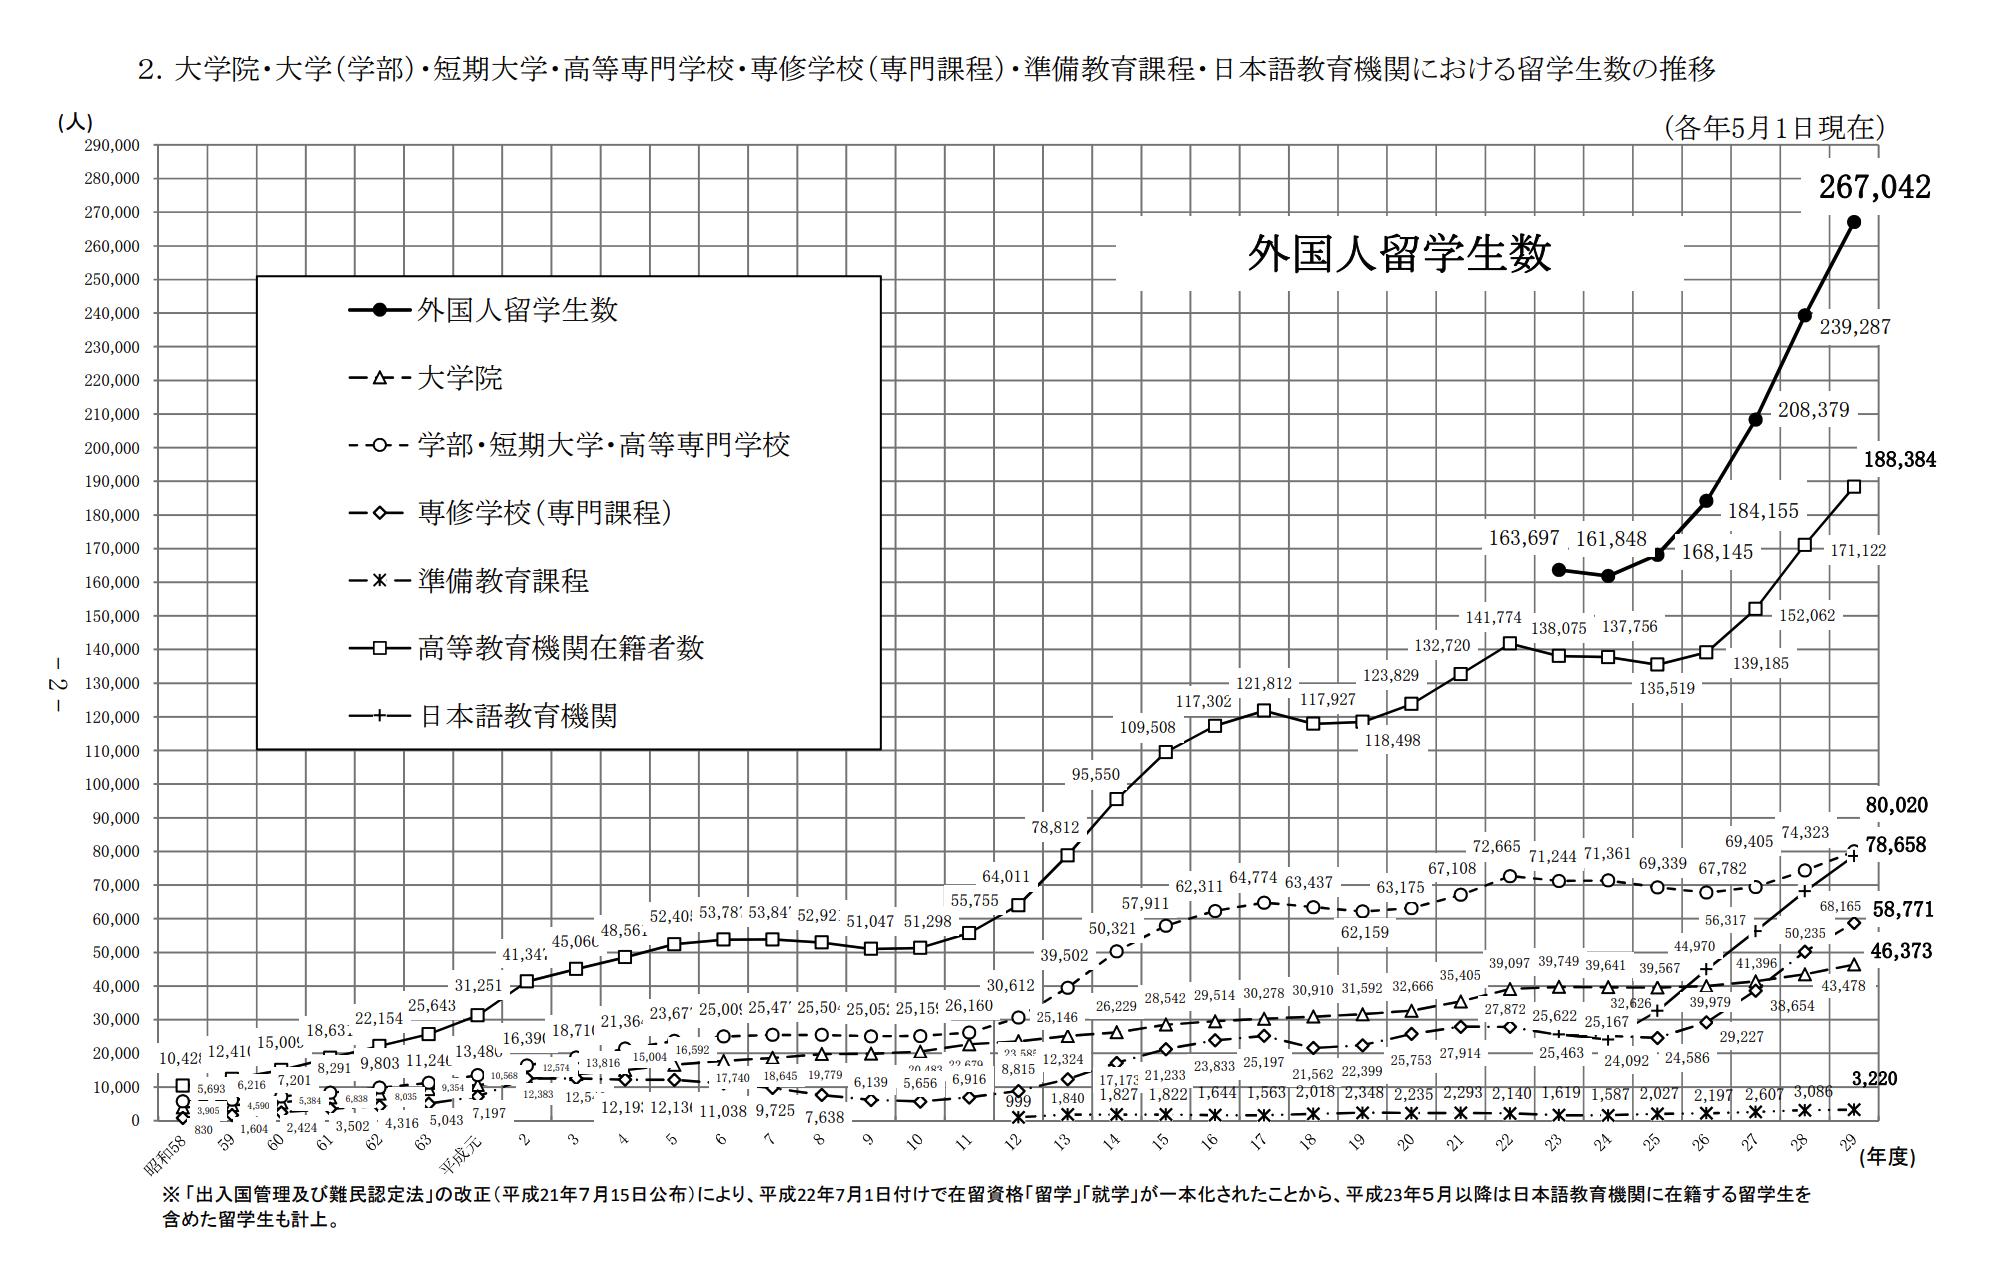 大学院・大学・短期大学・高等専門学校・専修学校・準備教育課程日本語教育機関における留学生の推移